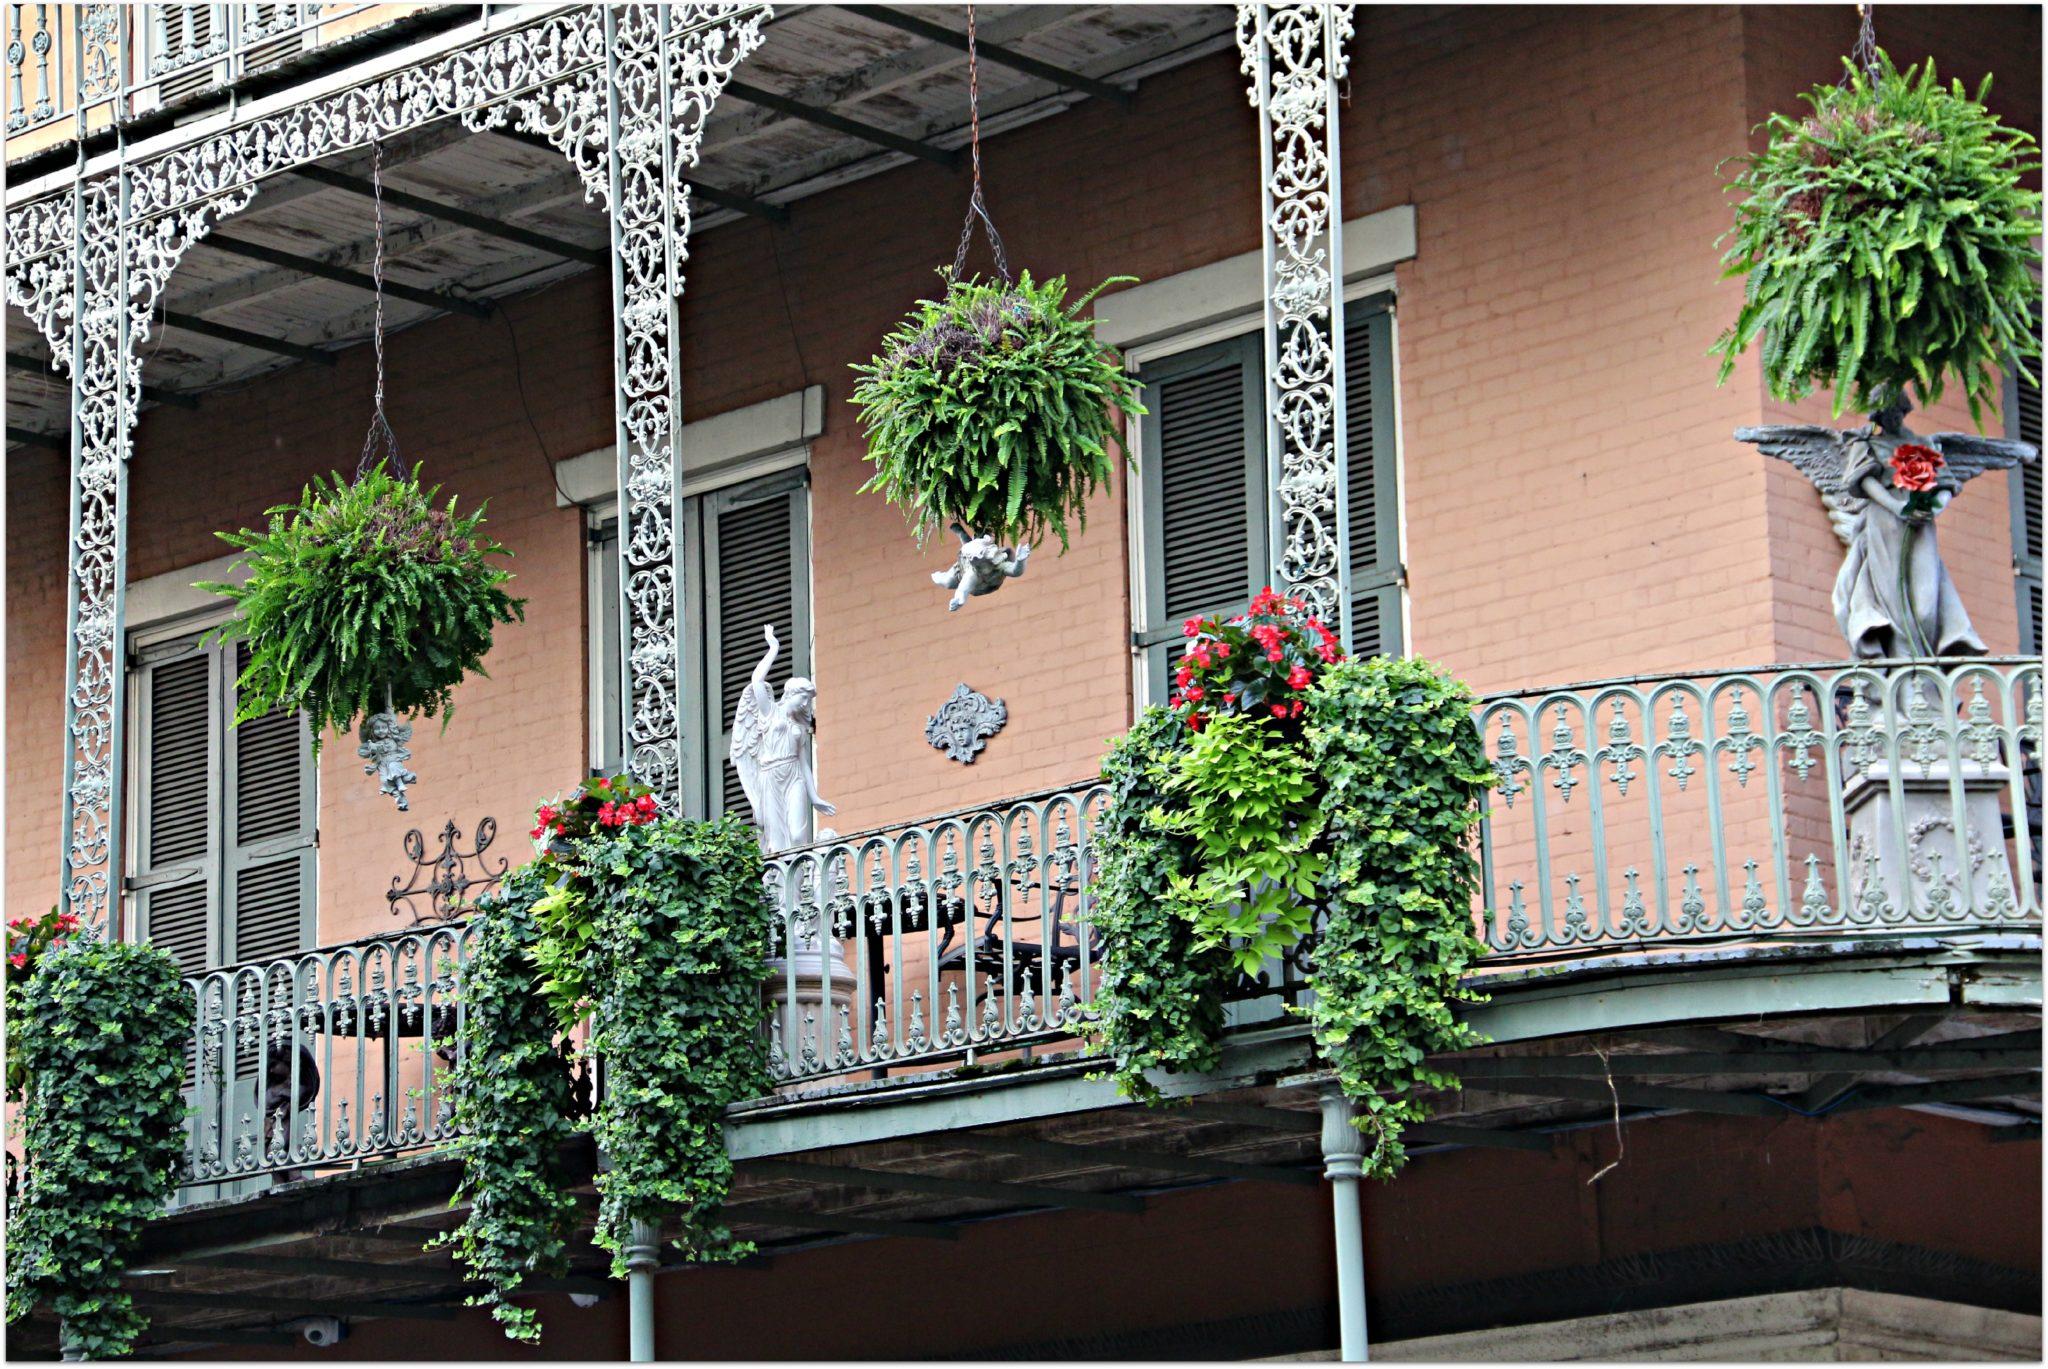 Balconies on Royal Street